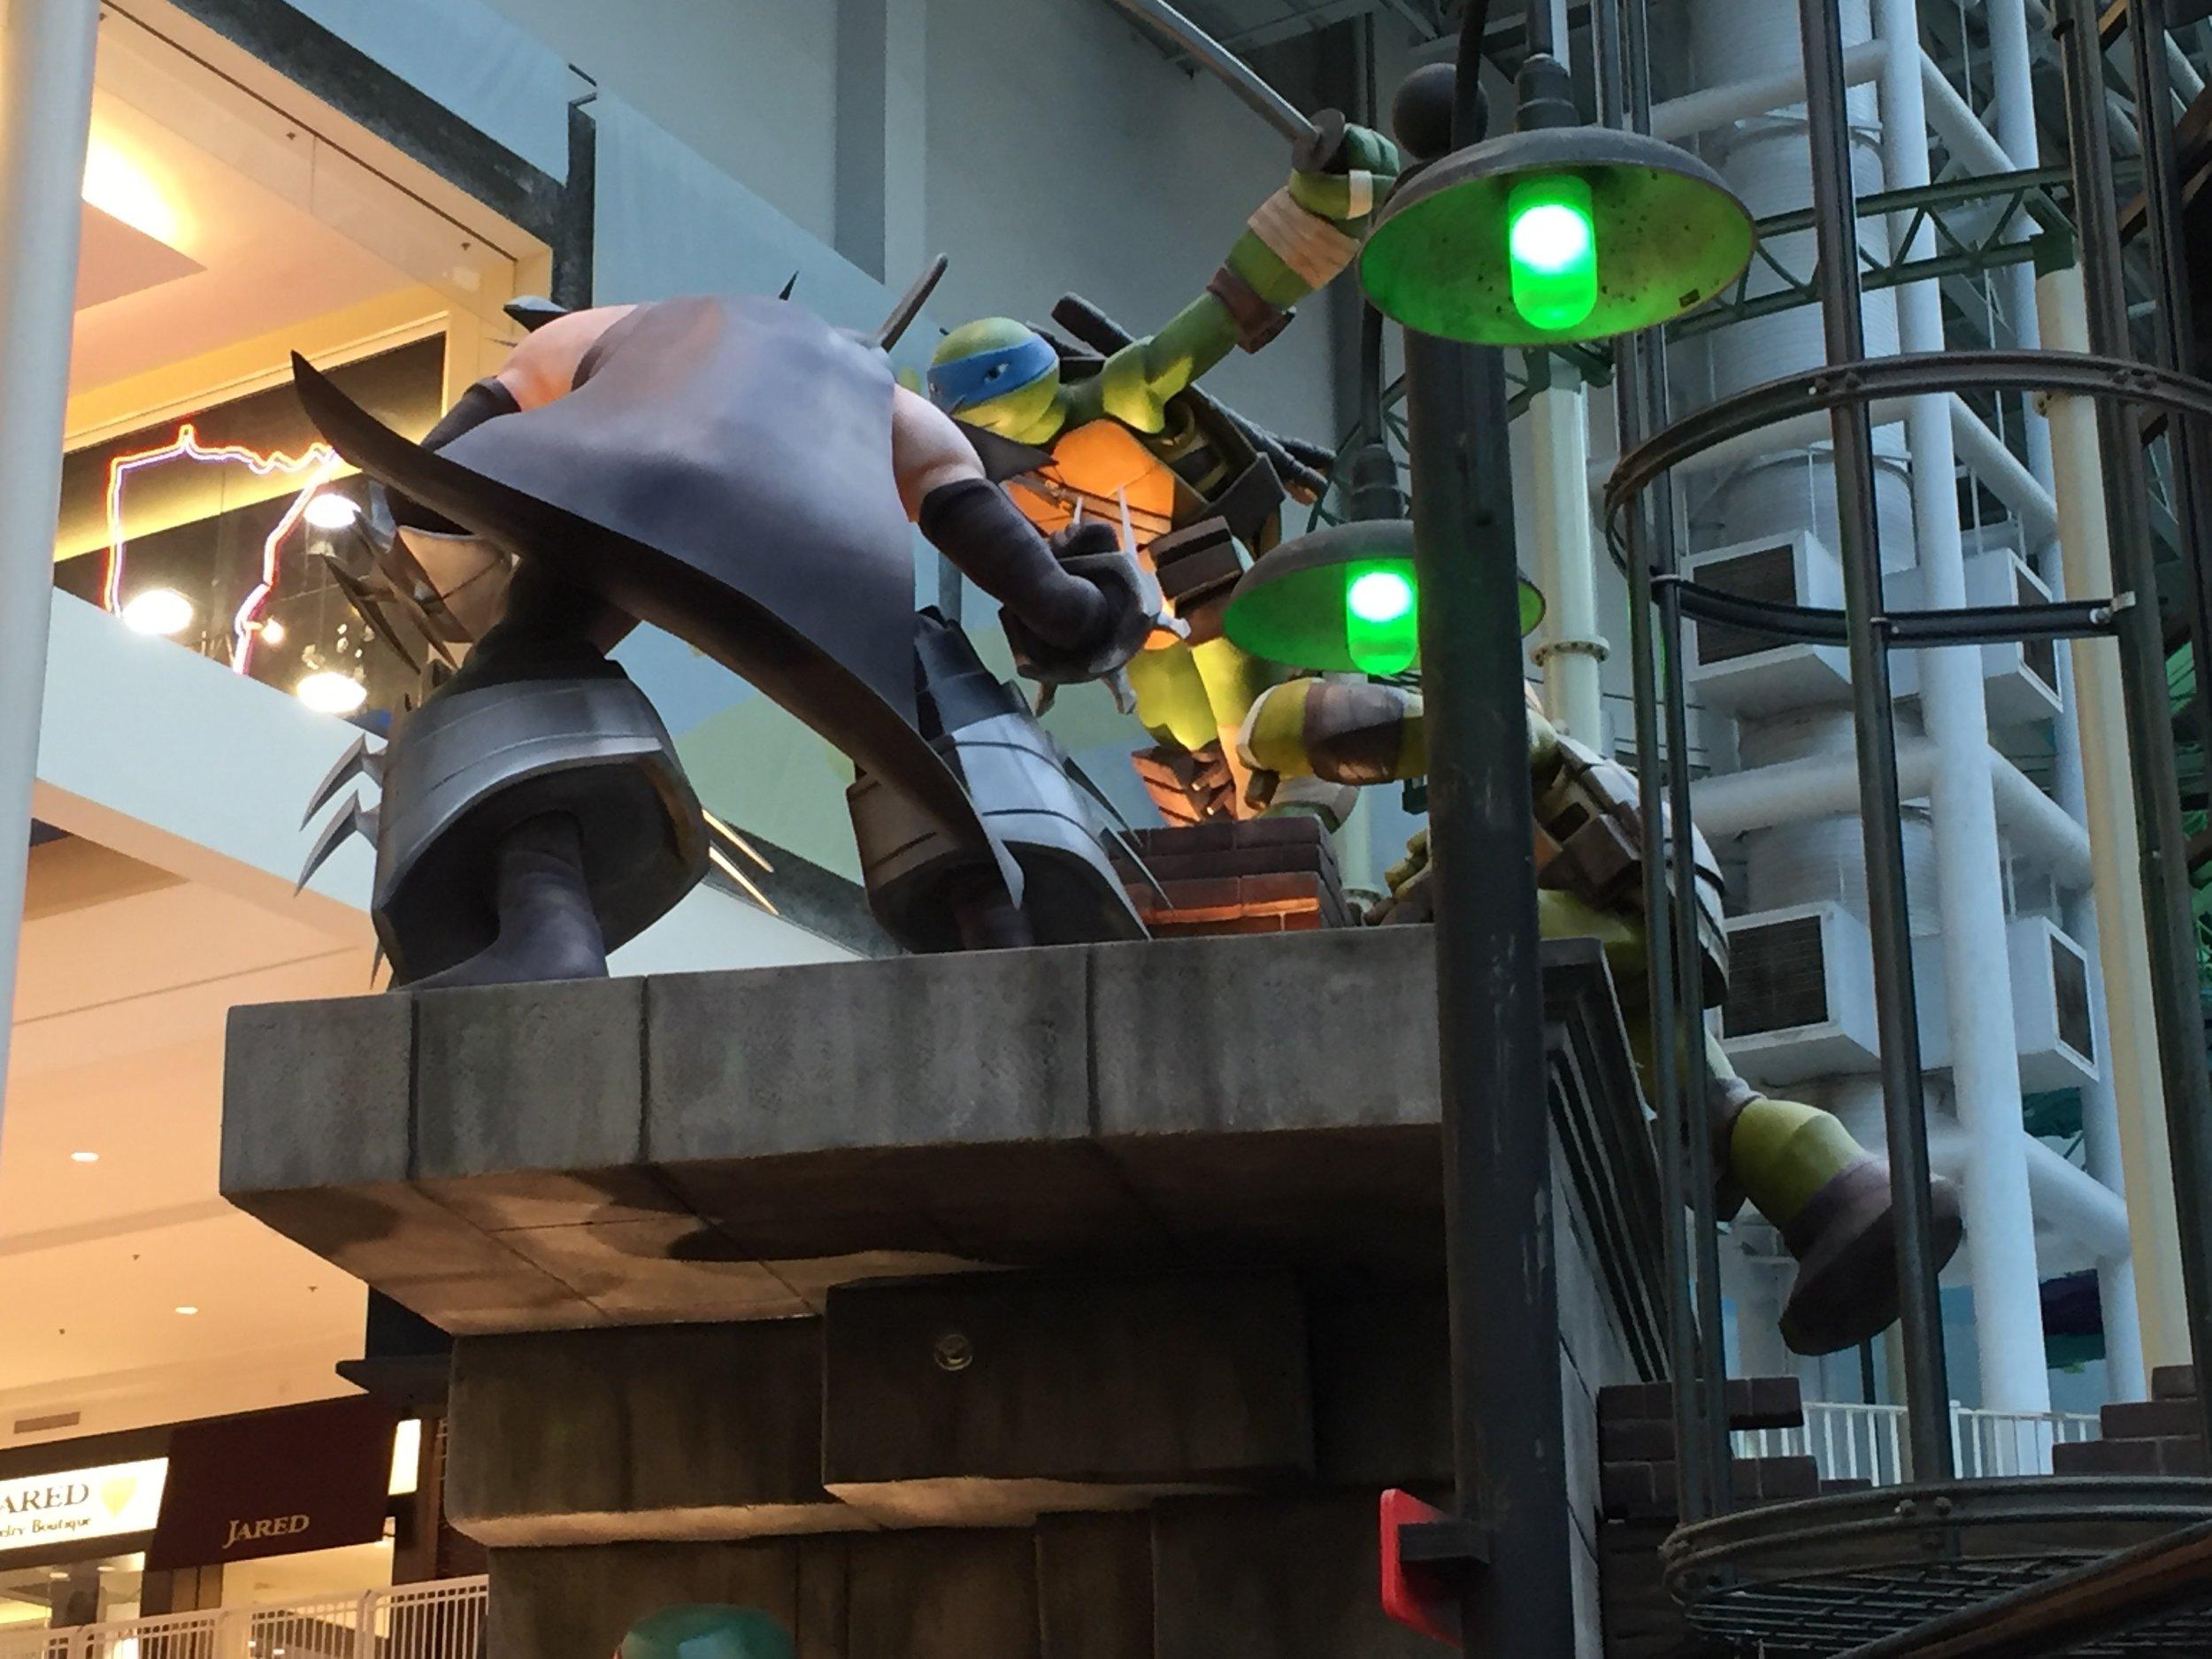 Parkwide Lighting, Nickelodeon Universe at Mall of America - Minneapolis, MN